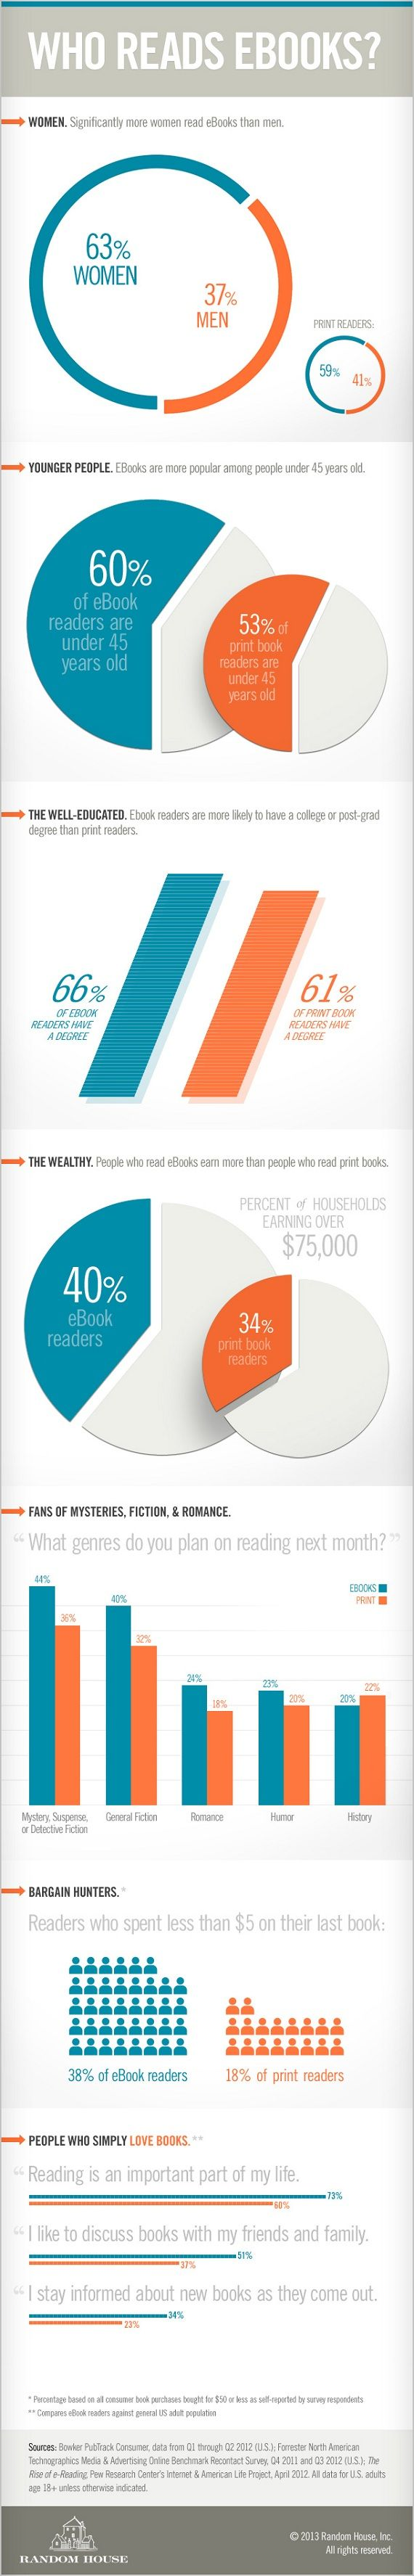 Who Reads Ebooks From Random House Mondadory Press